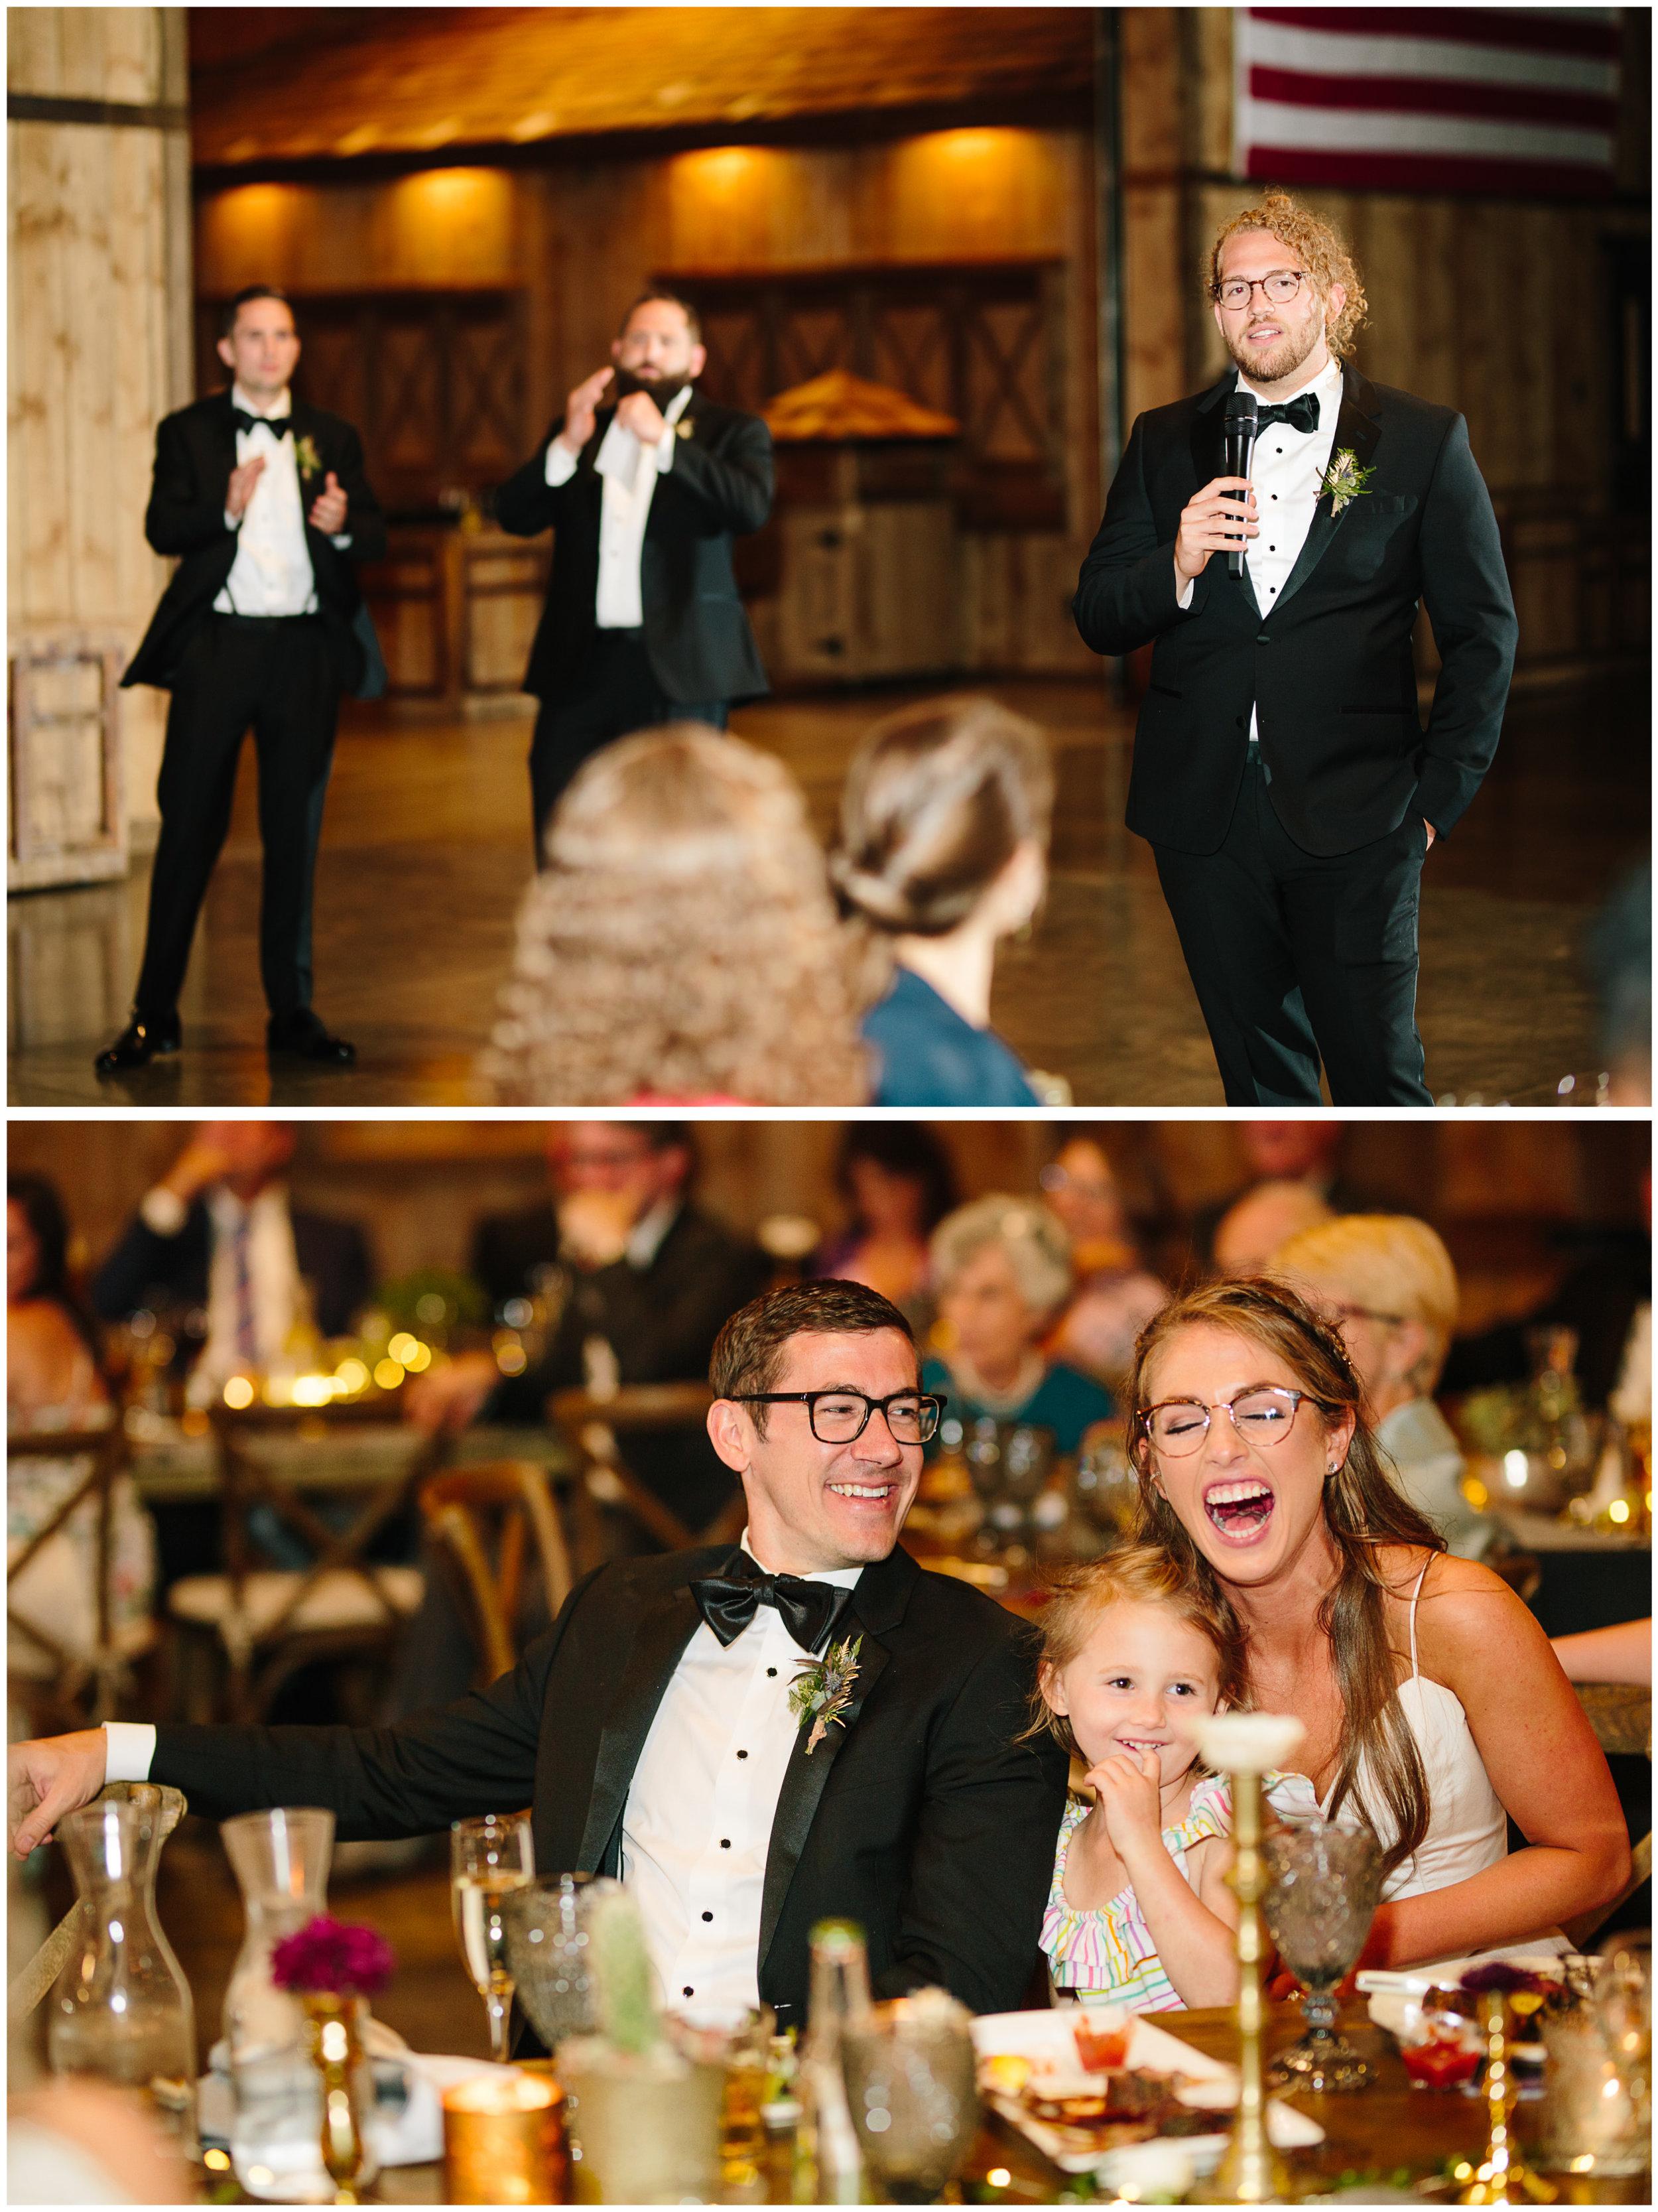 spruce_mountain_ranch_wedding_78.jpg